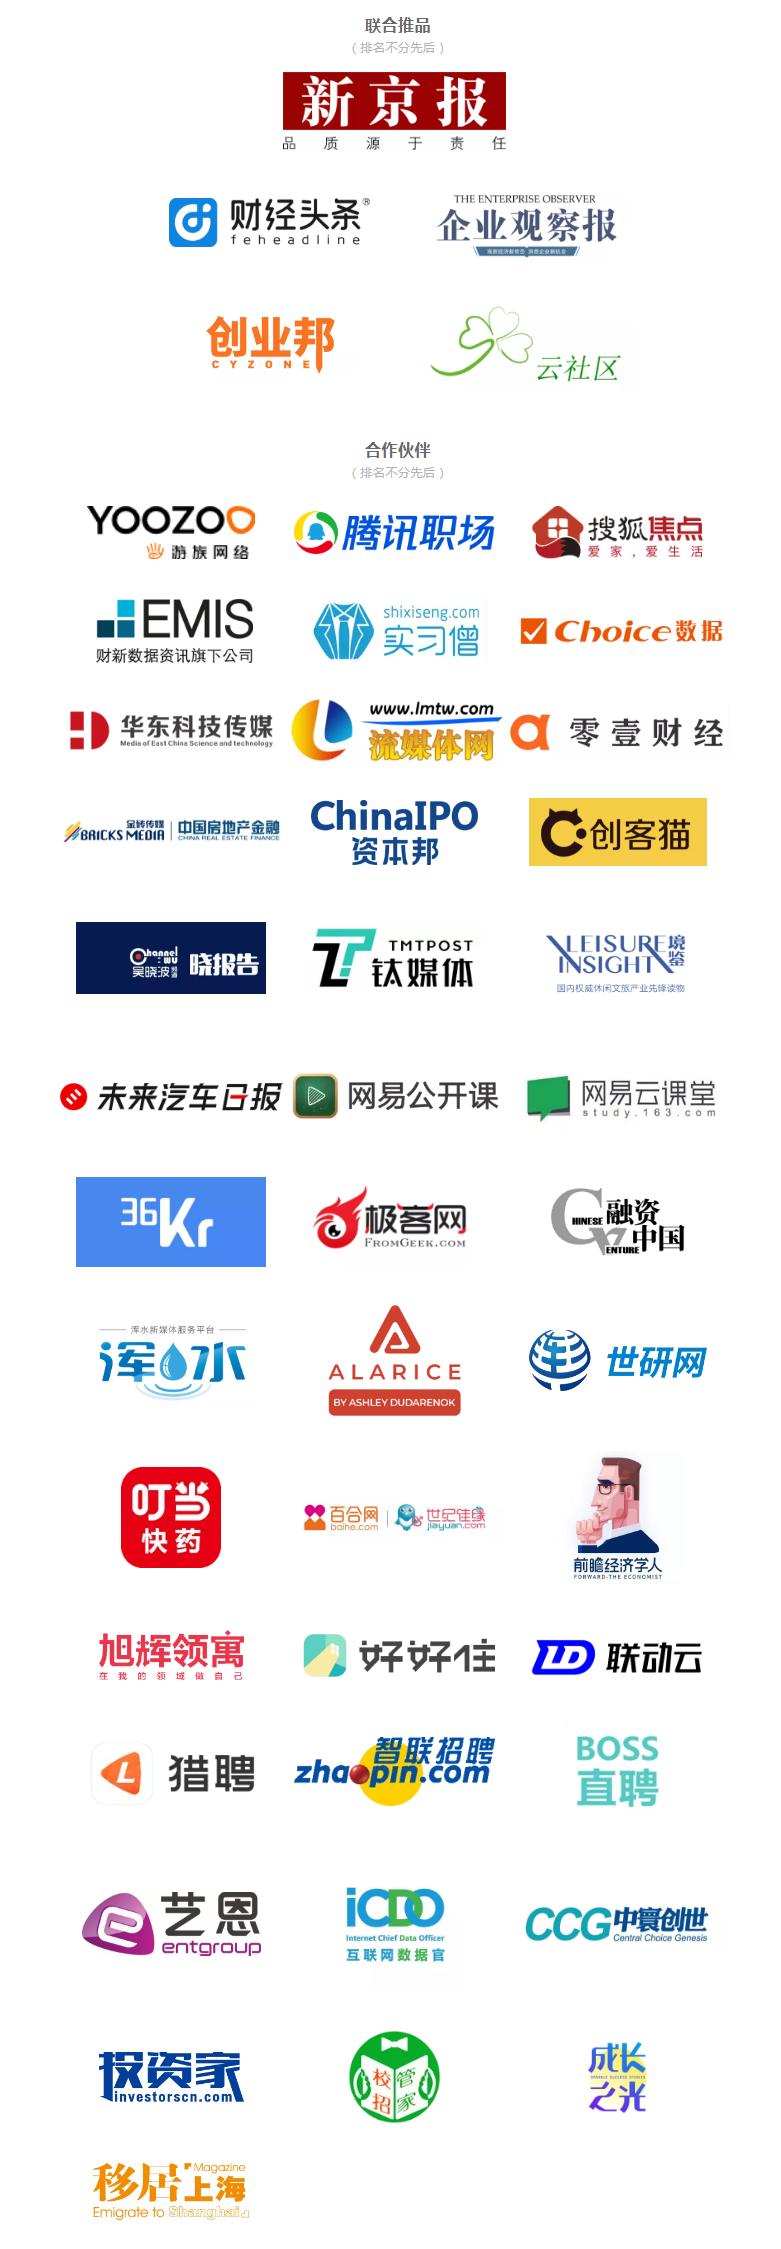 Mob研究院 2019中国移动互联网年终关键词盘点.png